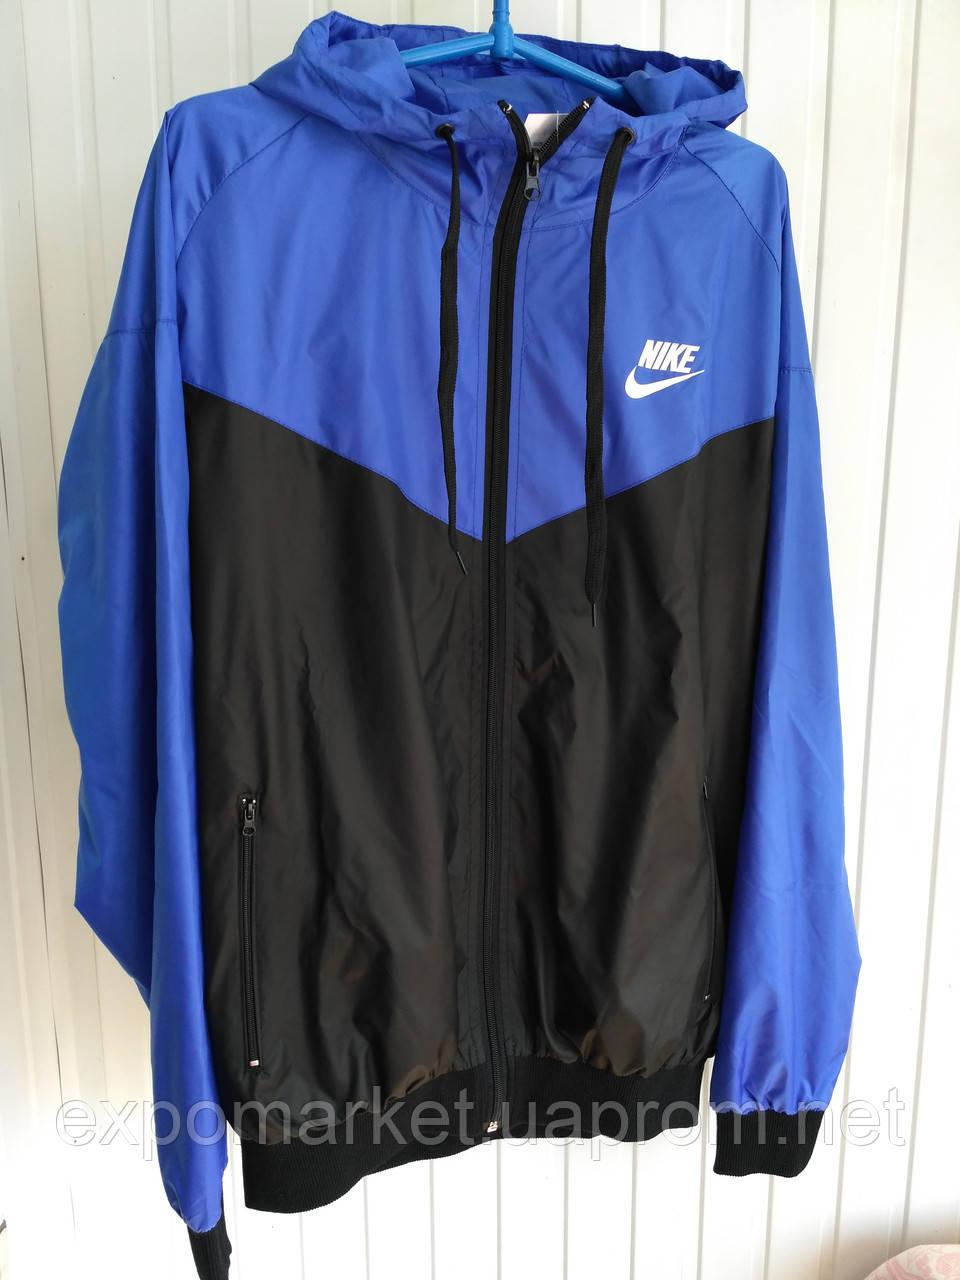 09430a29 Мужской спортивный костюм Nike весна-лето плащевка, спортивный ...